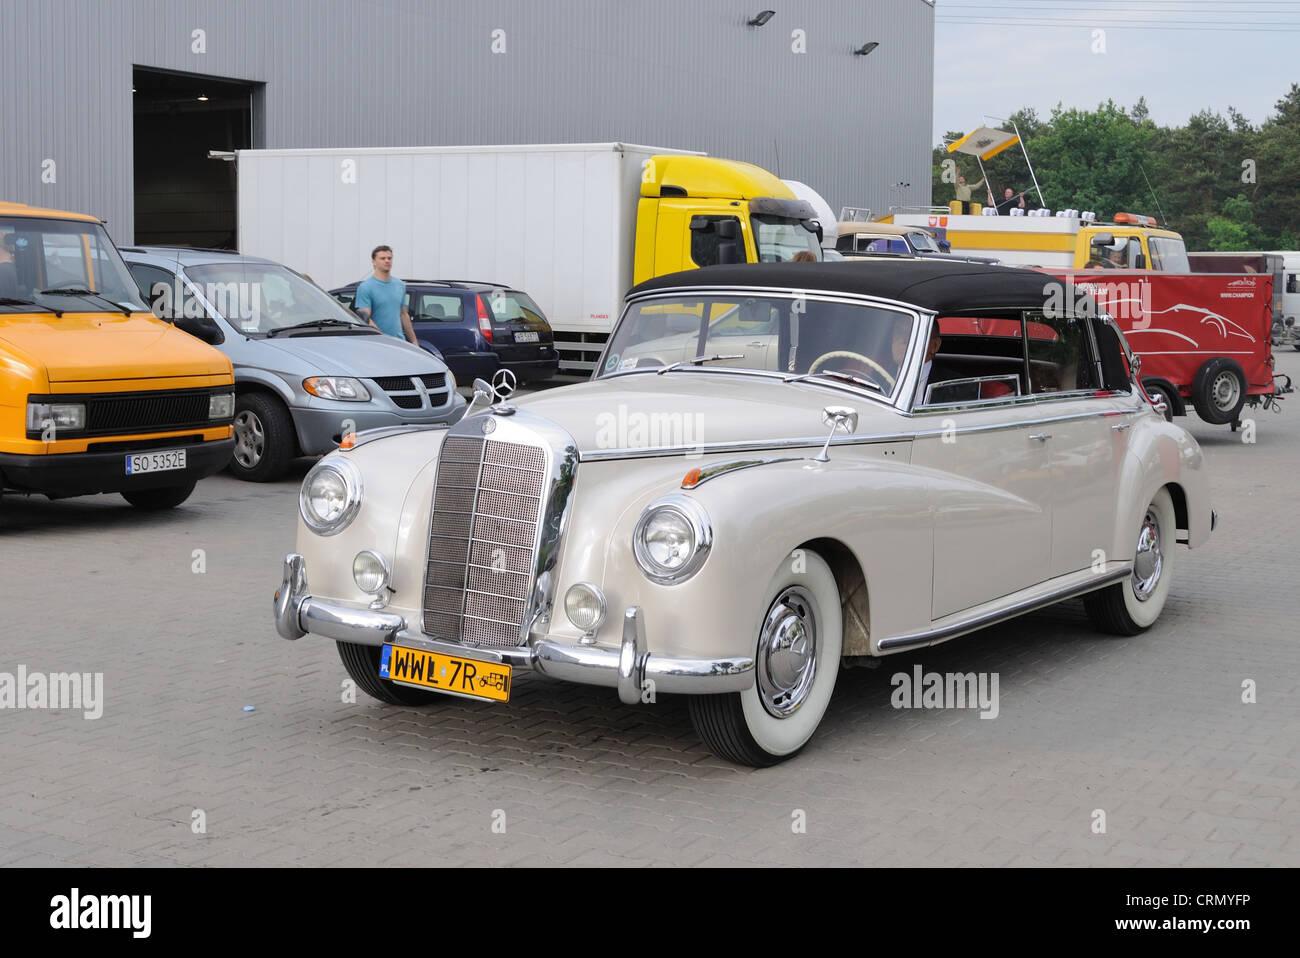 oldtimer cabrio mercedes benz 300 c stockfoto, bild: 49018474 - alamy